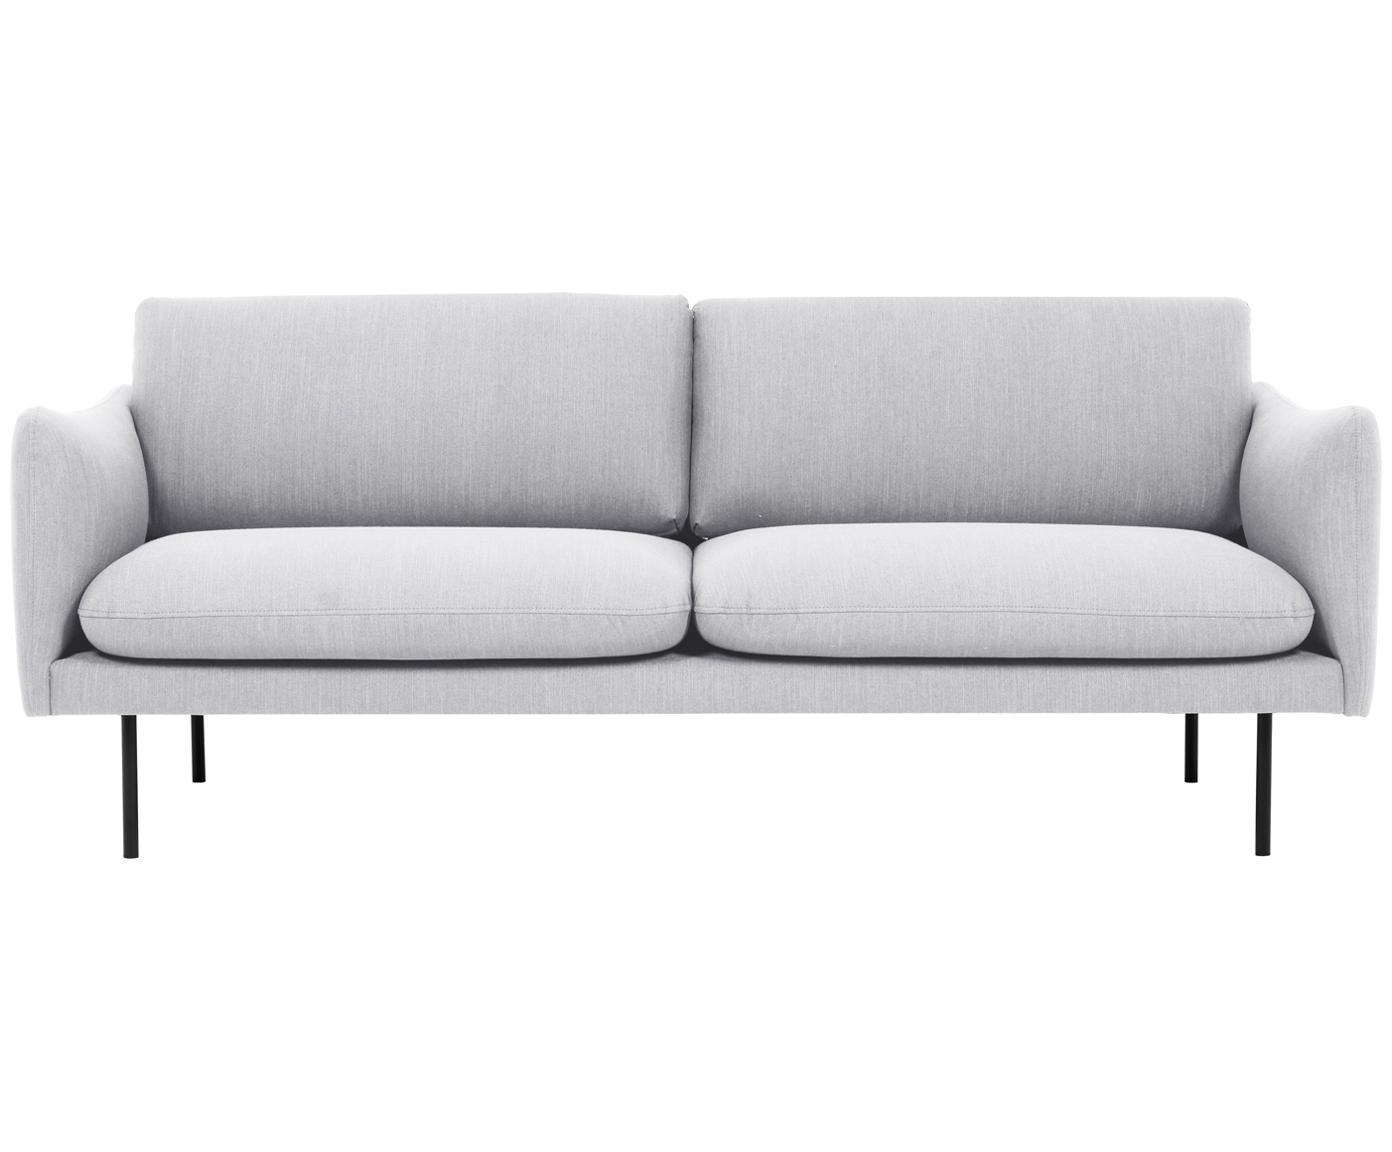 Sofa Moby (2-Sitzer), Bezug: Polyester 60.000 Scheuert, Gestell: Massives Kiefernholz, Webstoff Hellgrau, B 170 x T 95 cm